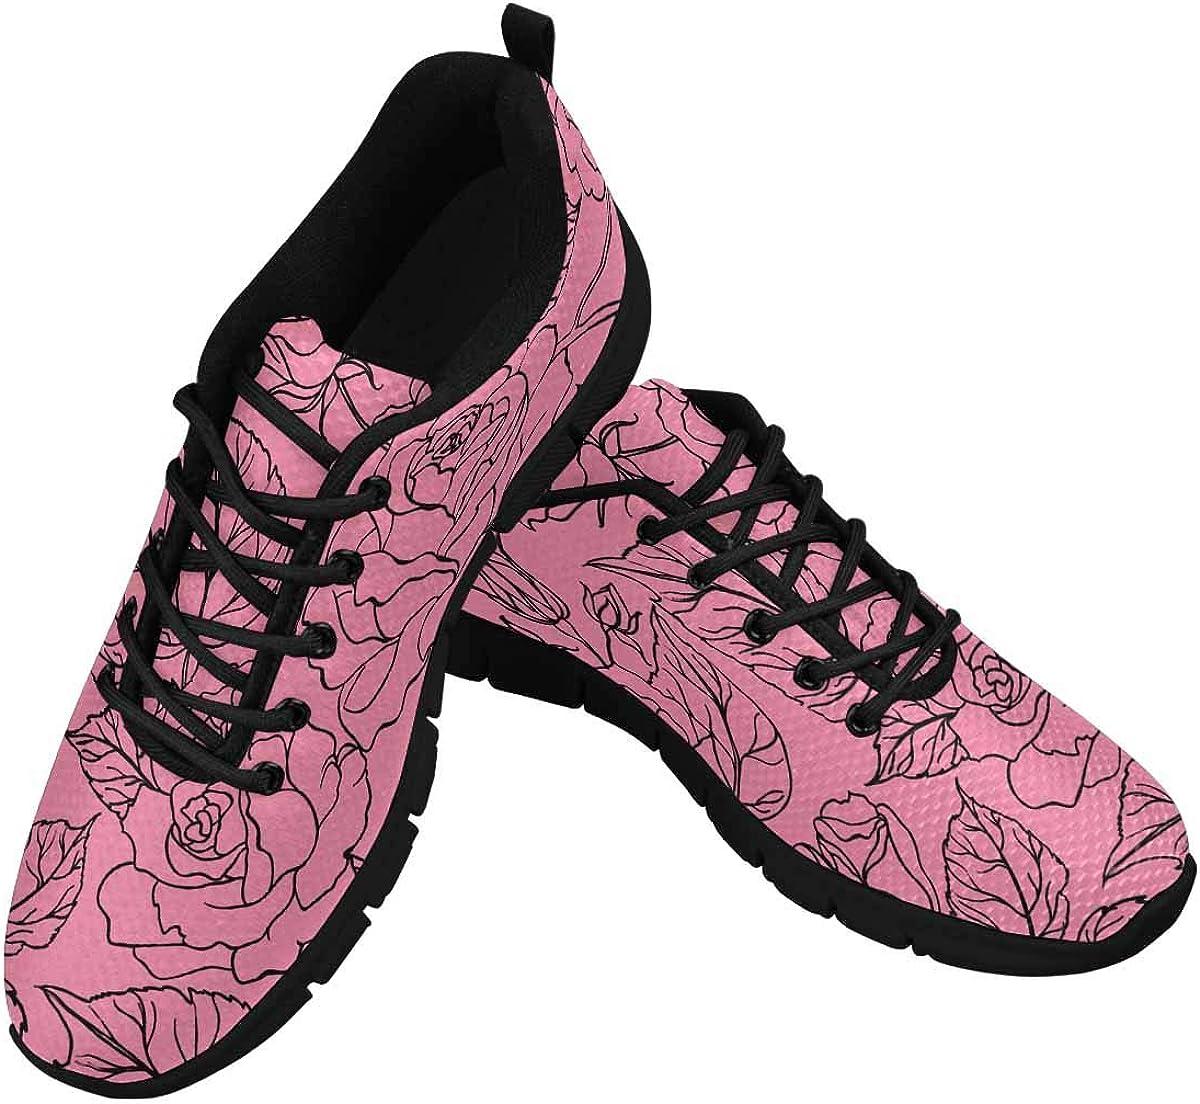 InterestPrint Flower Leaves Pink Women's Athletic Walking Shoes Comfort Mesh Non Slip